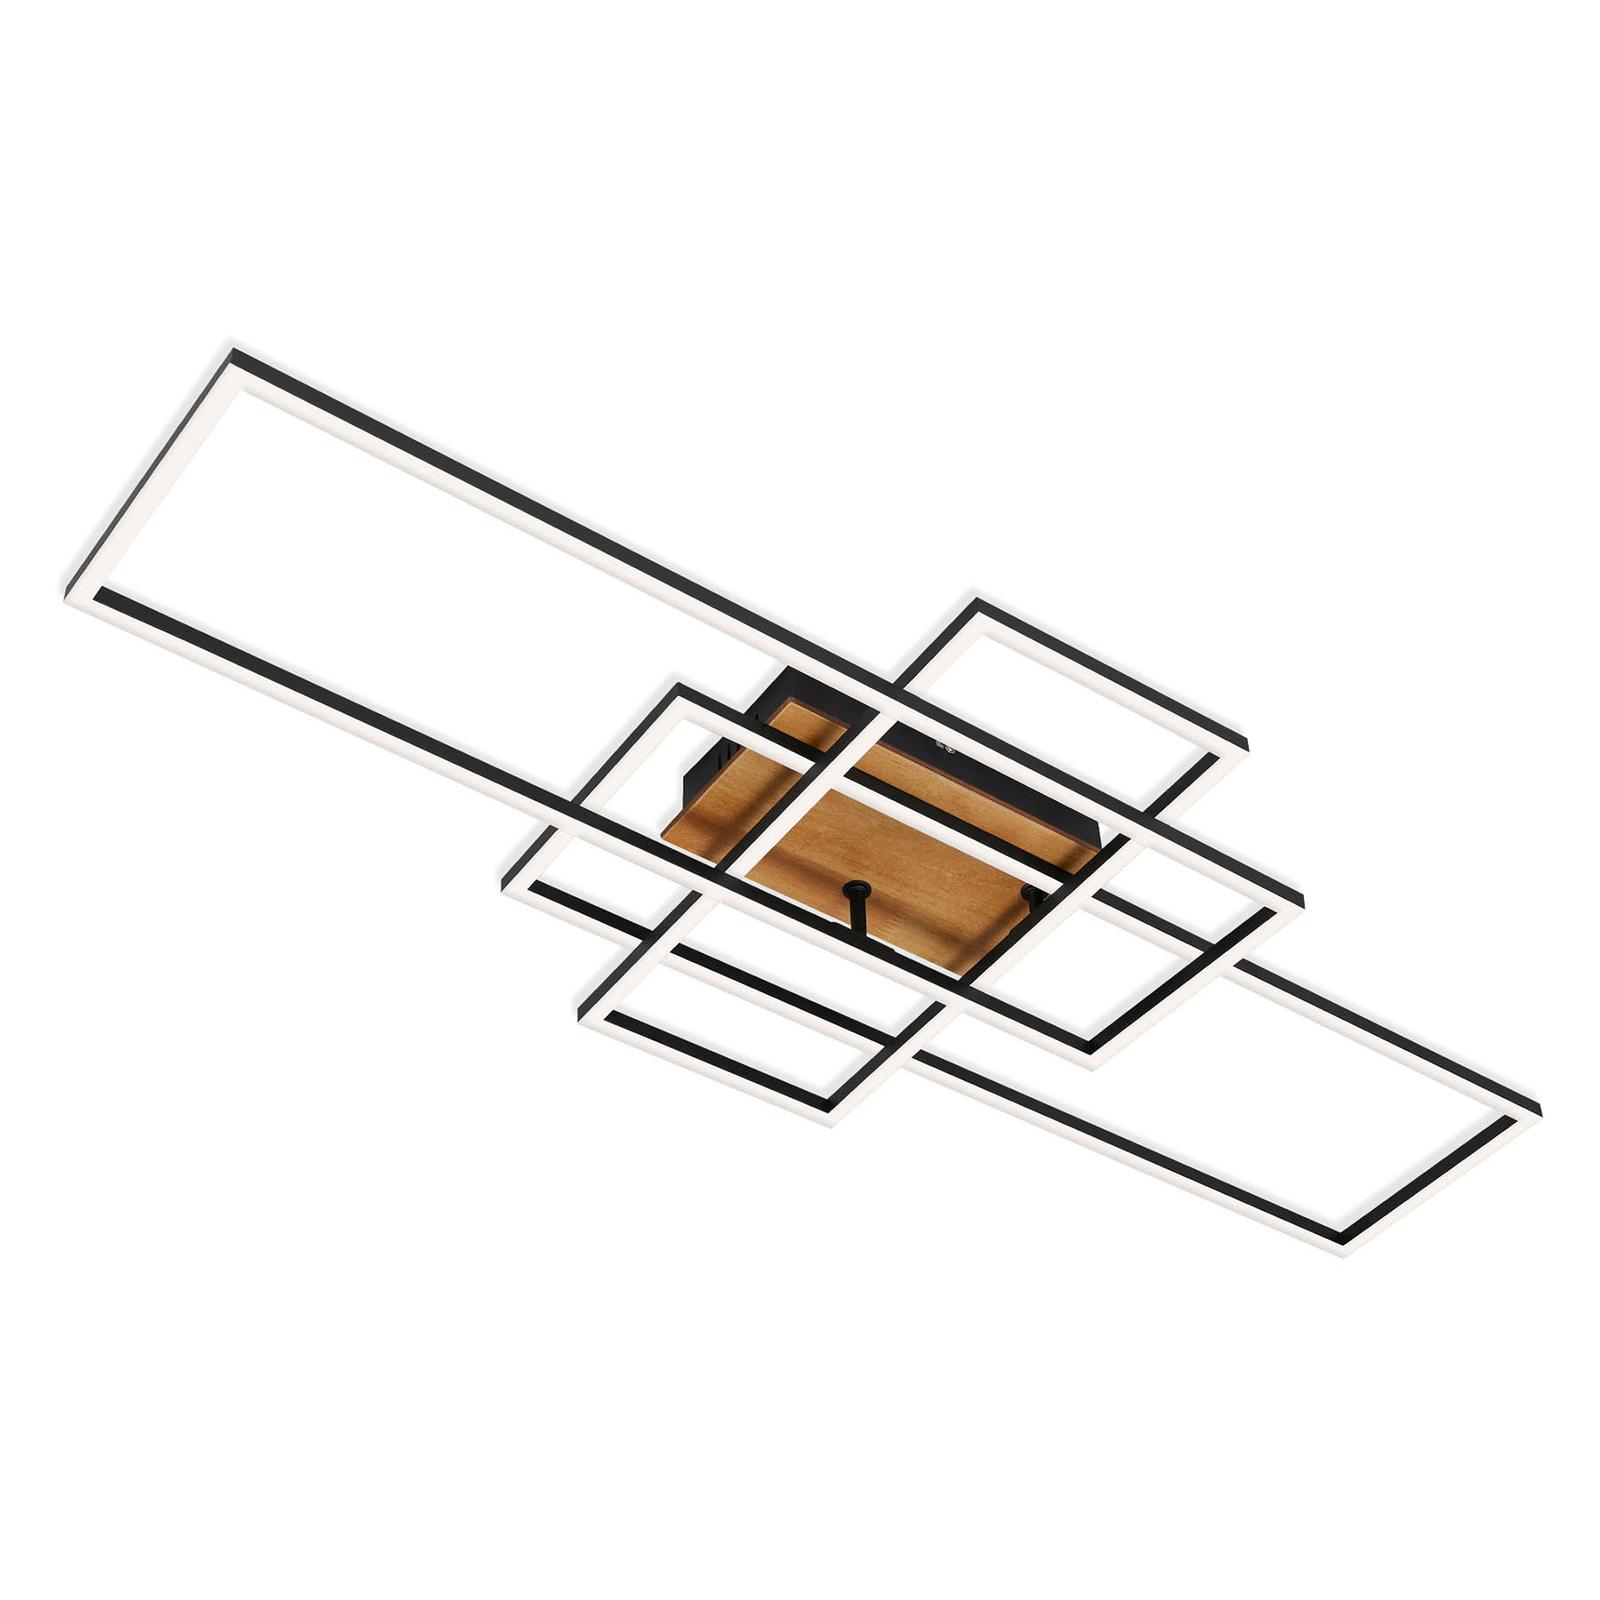 Taklampe Frame CCT, fjernkontroll, svart/tre